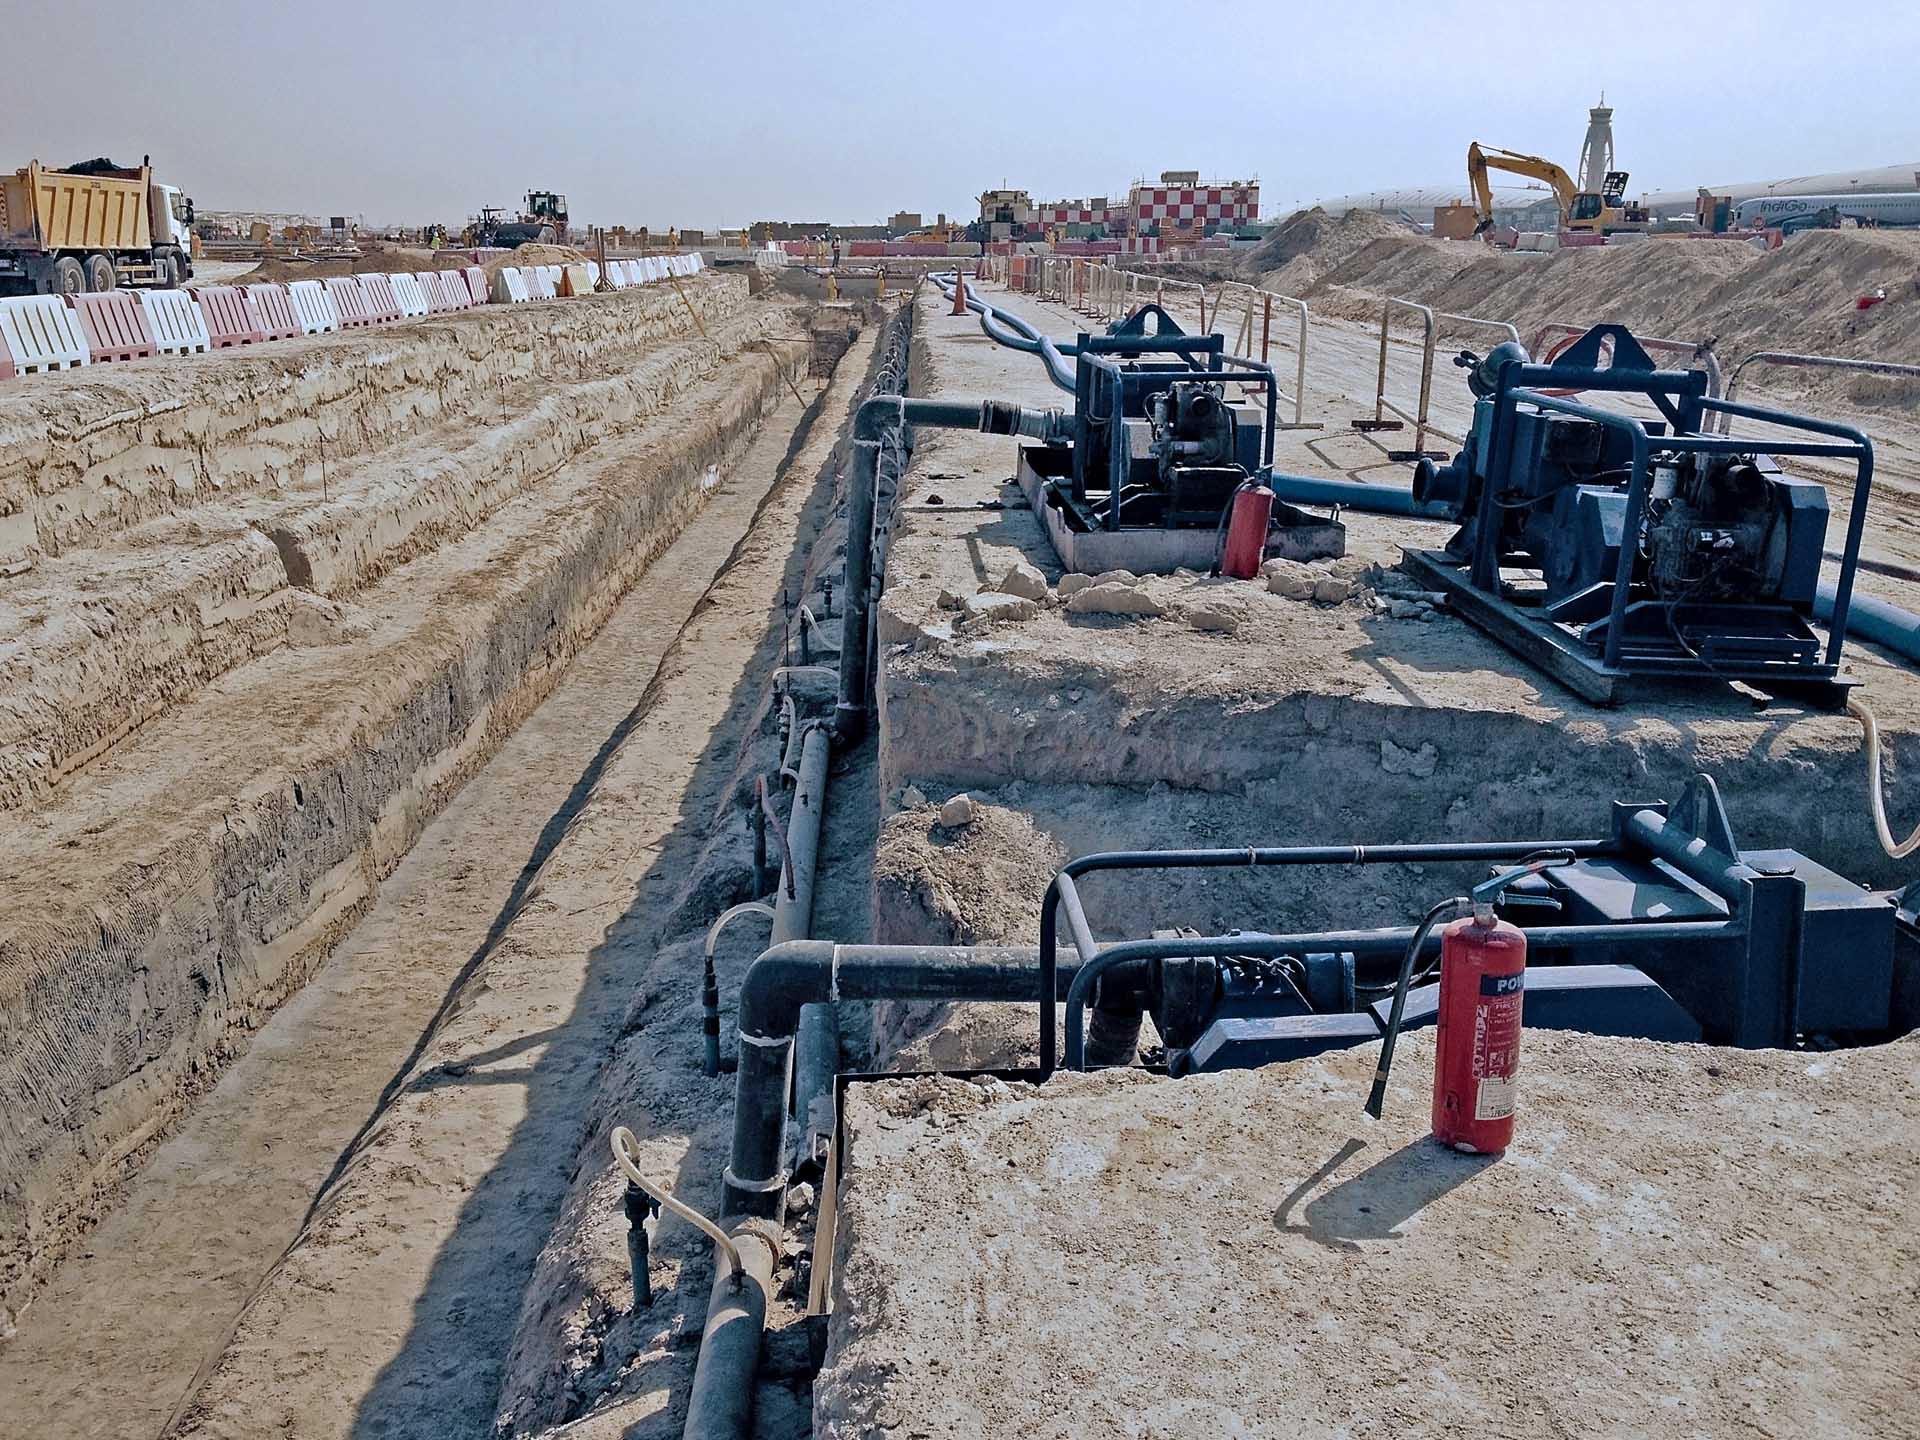 Pipeline wellpoint dewatering, dubai airport